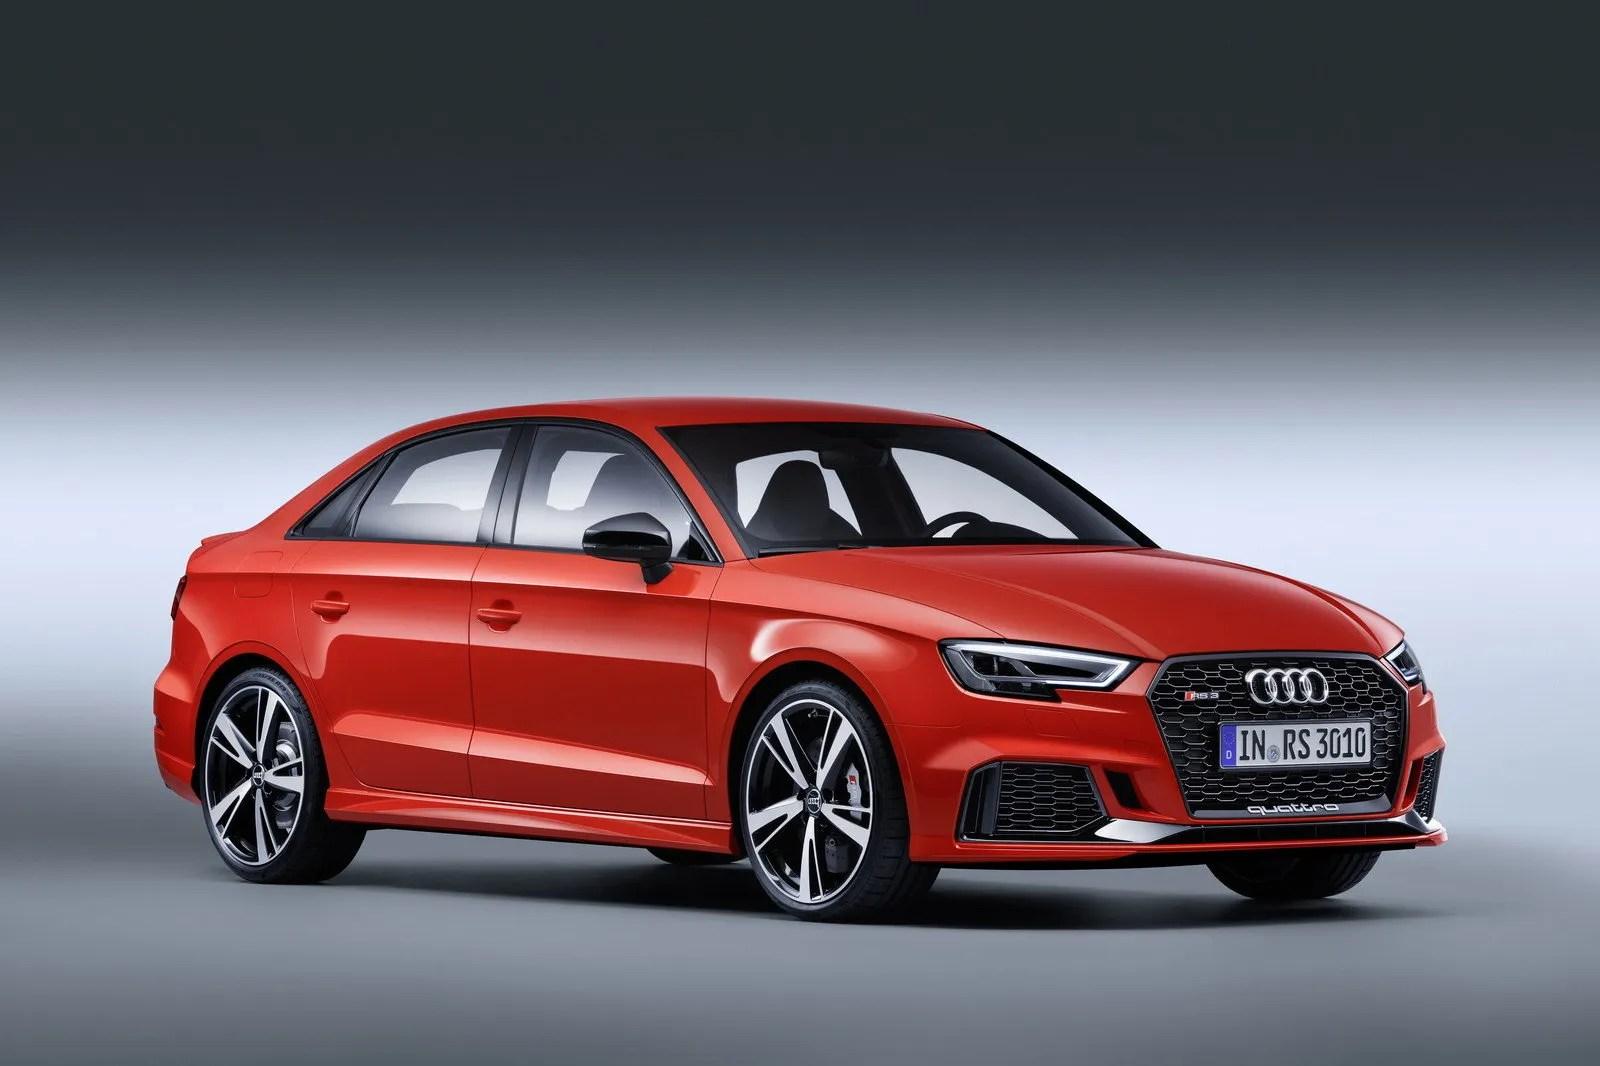 2018 Audi Rs3 Sedan  Picture 690334  Car Review @ Top Speed